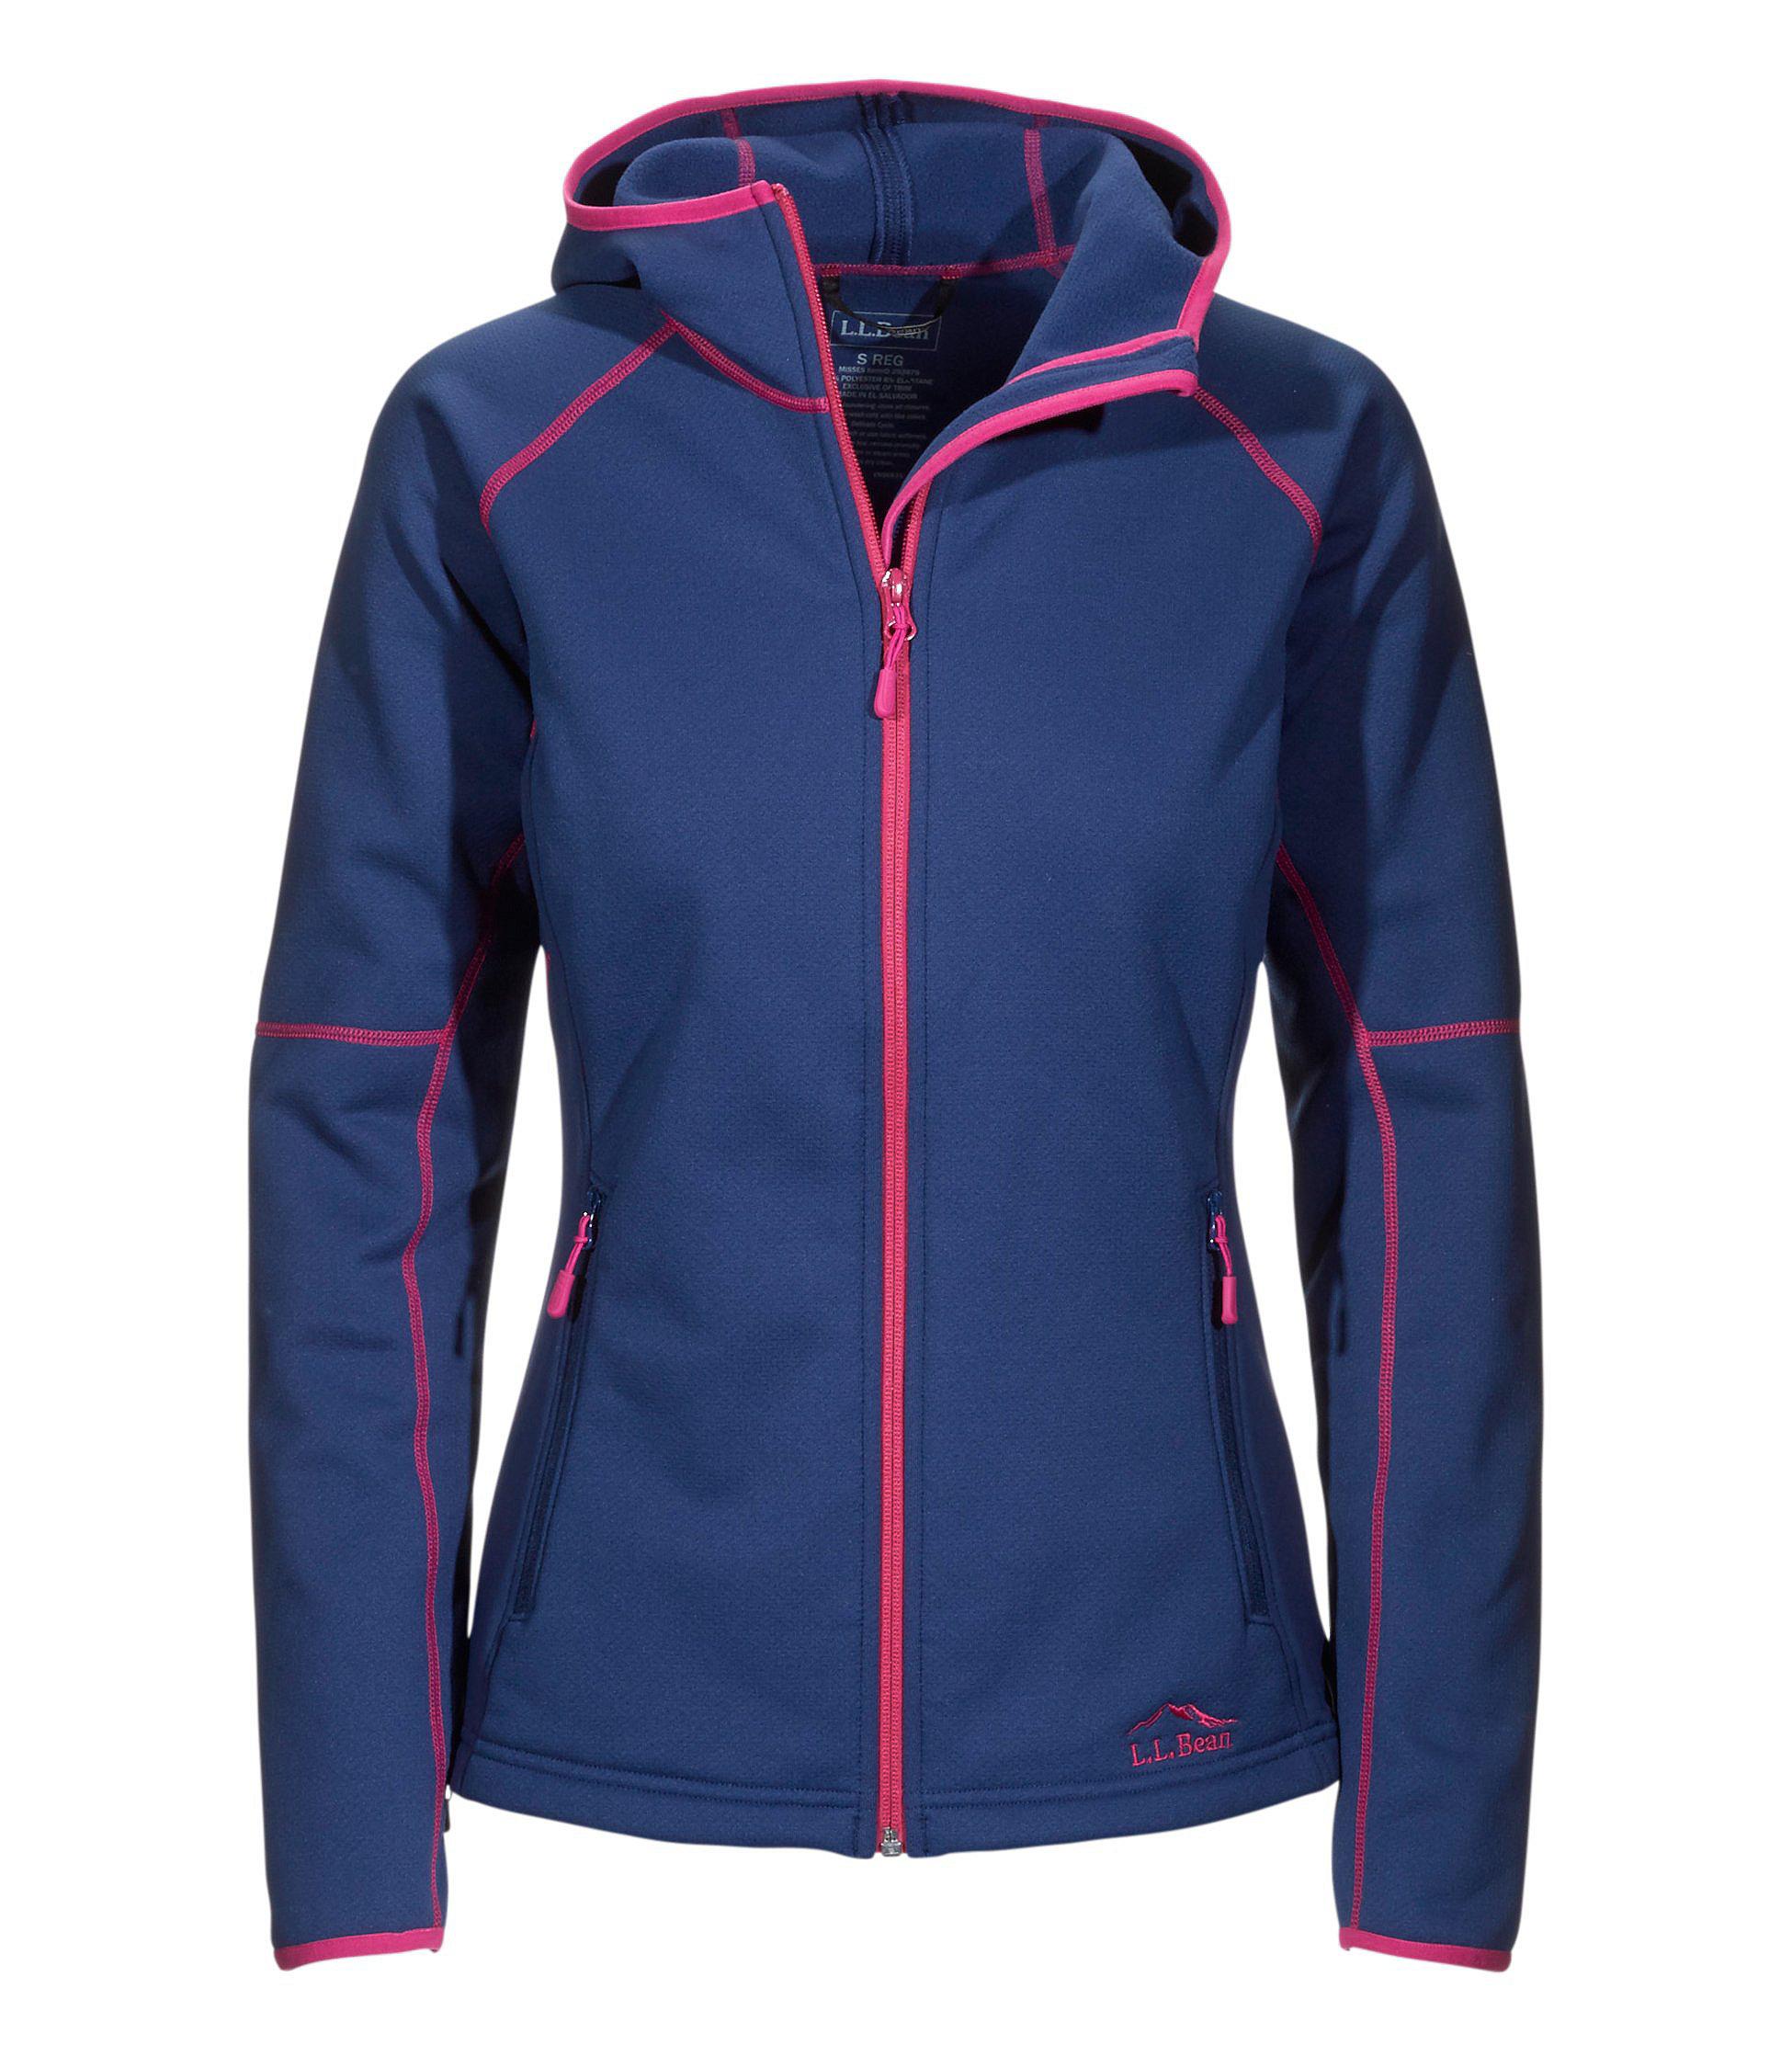 Women's L.L.Bean ProStretch Fleece Jacket, Hooded | Free Shipping ...